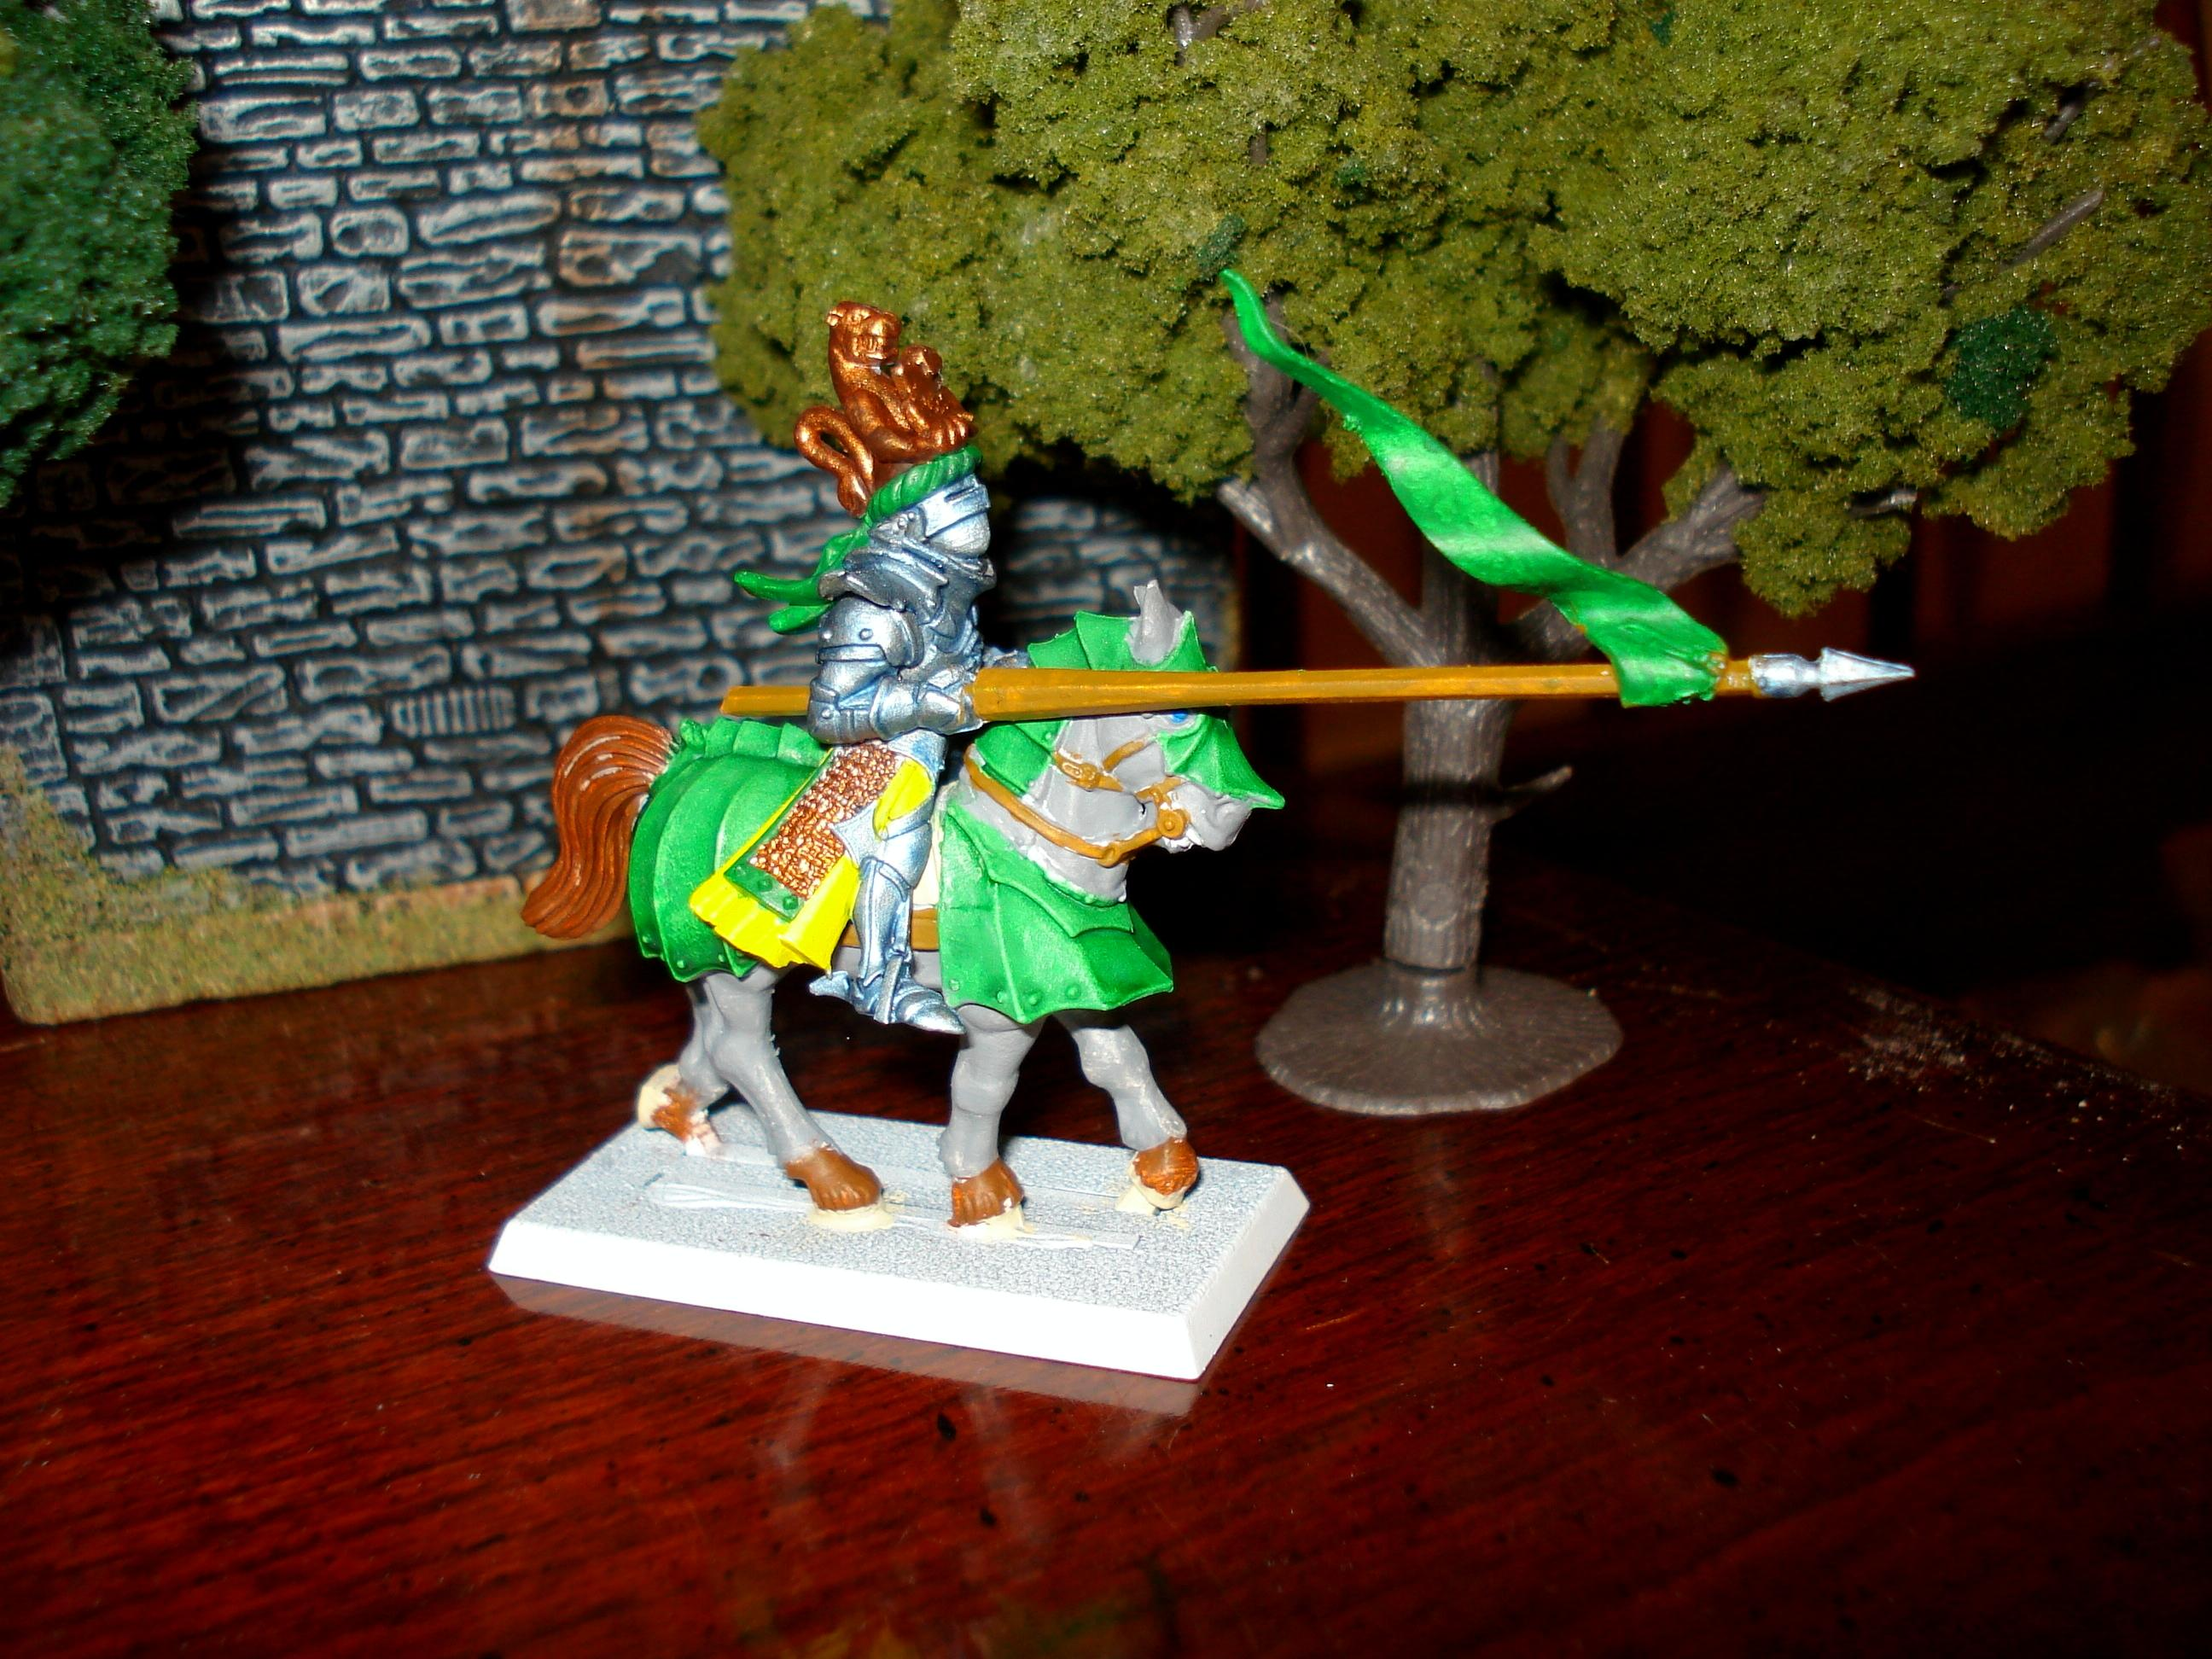 knight of stirland